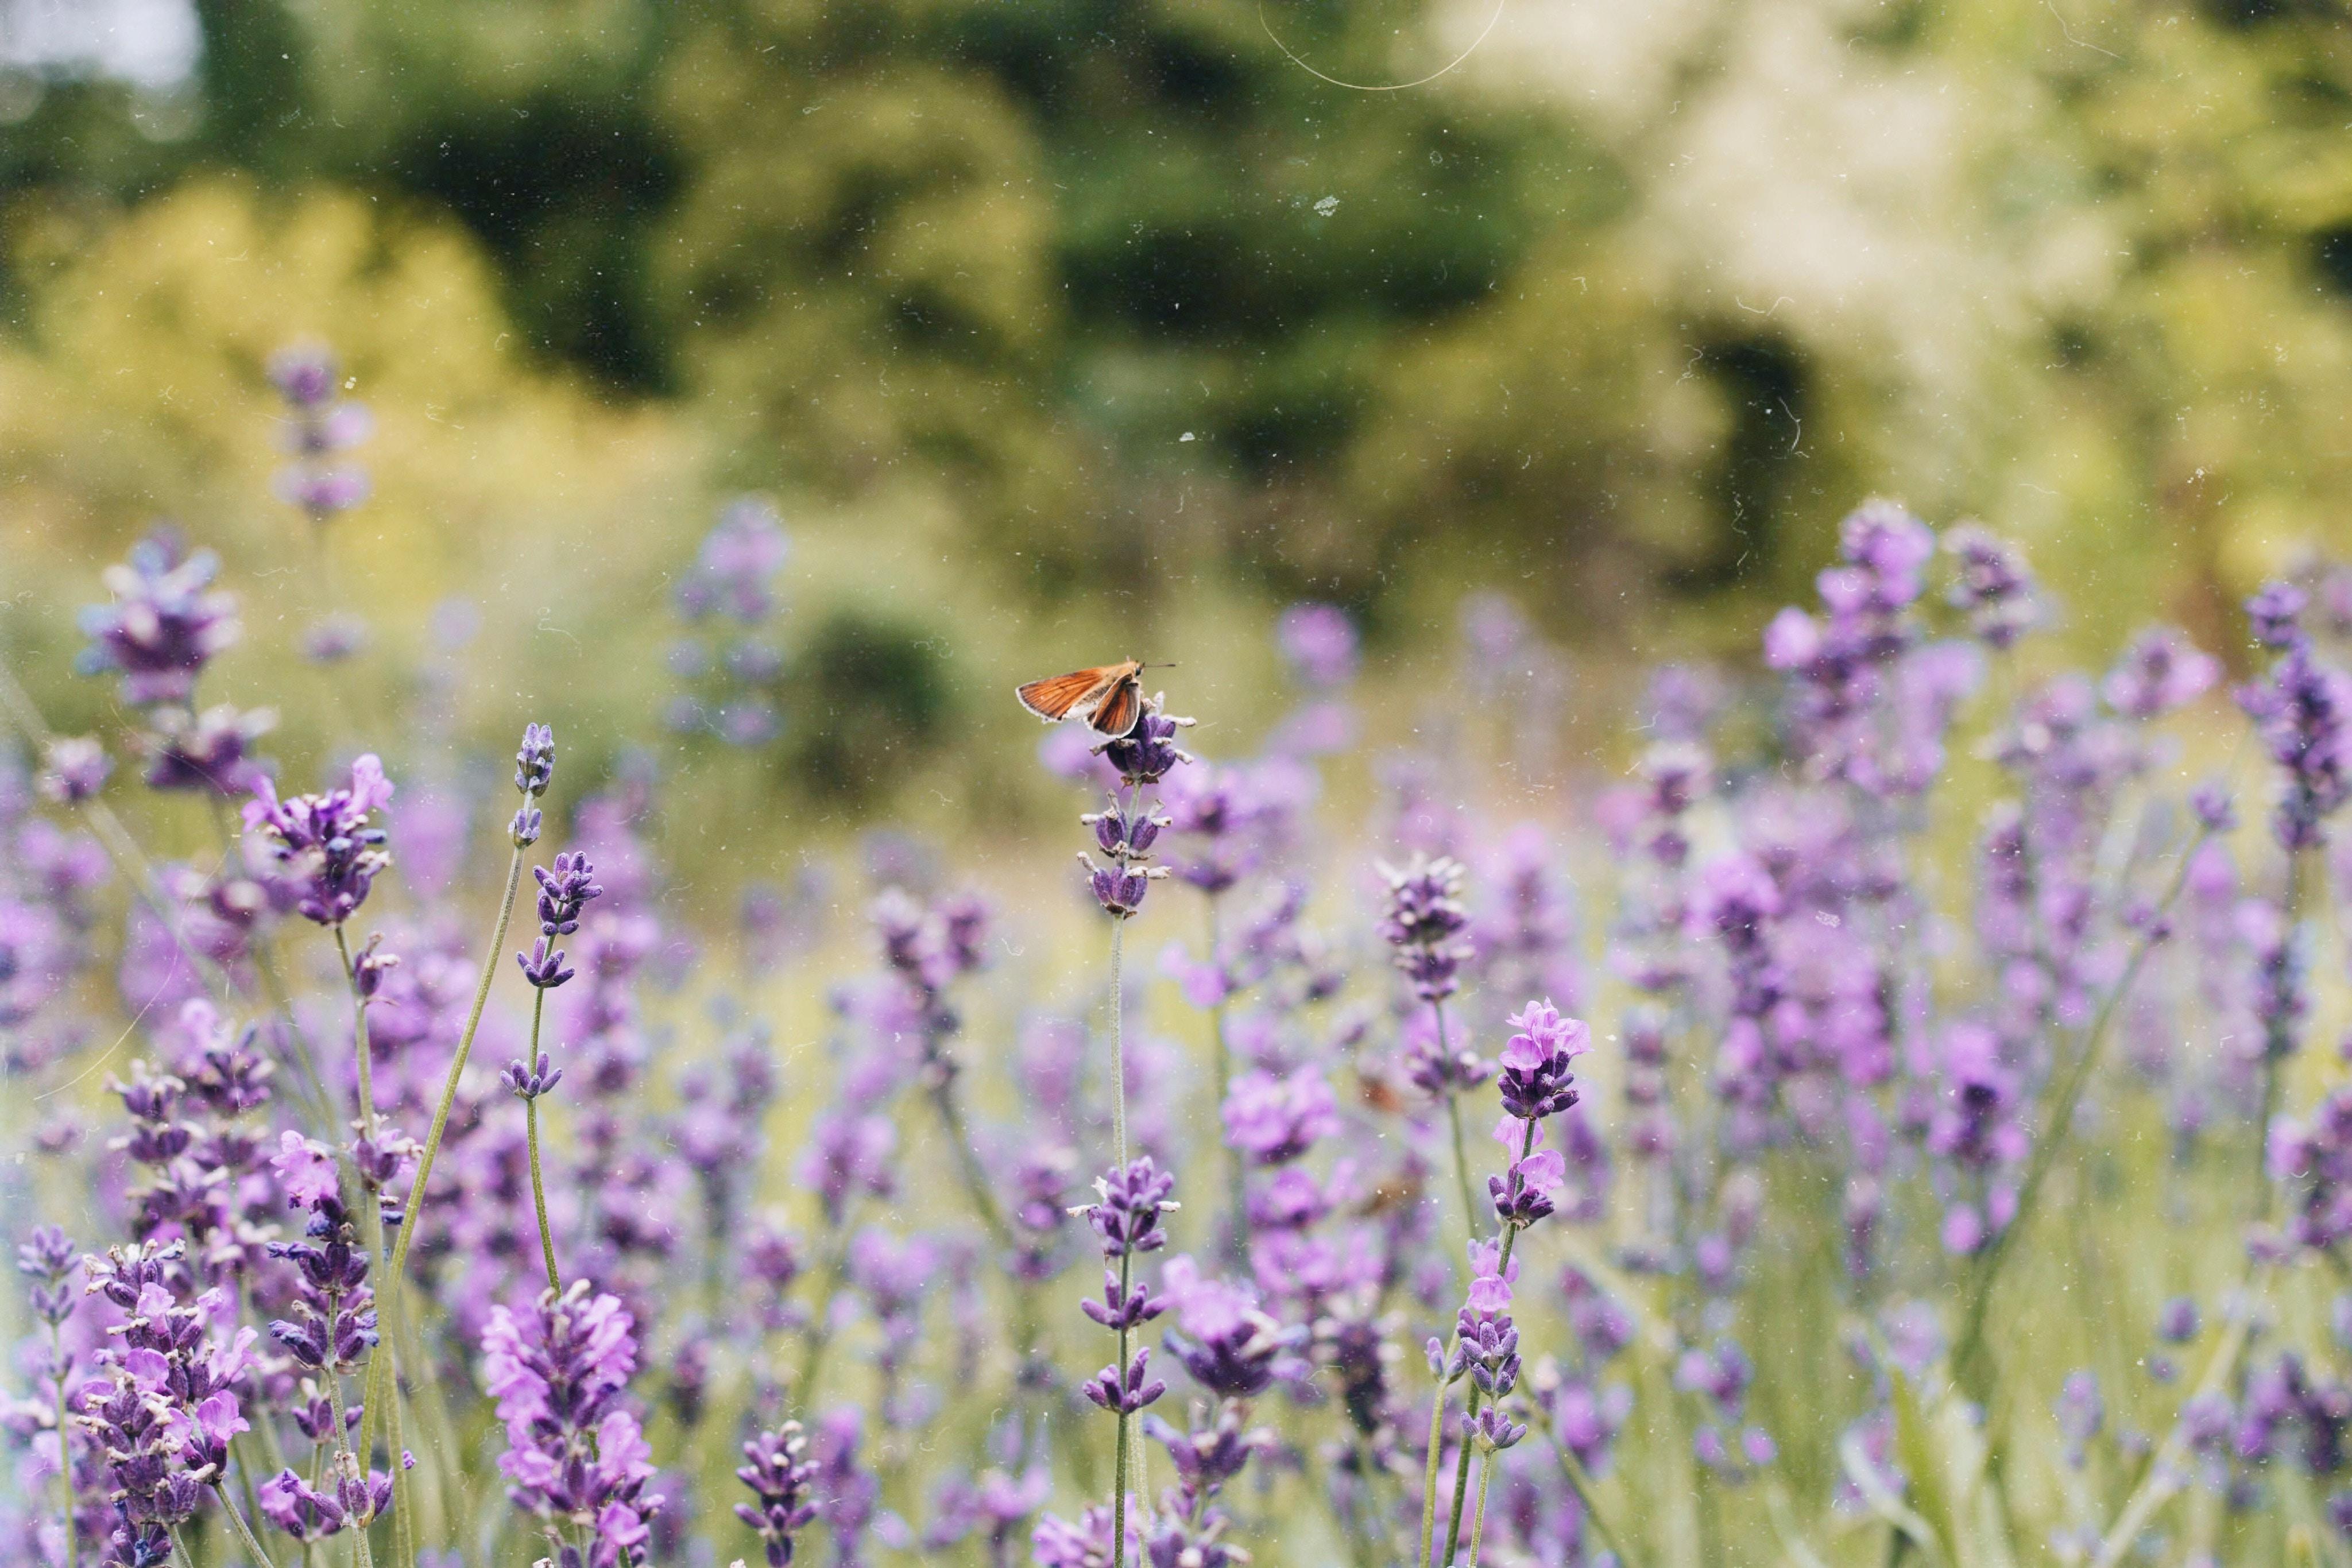 Sweet lavender – sex lavendelprodukter jag älskar